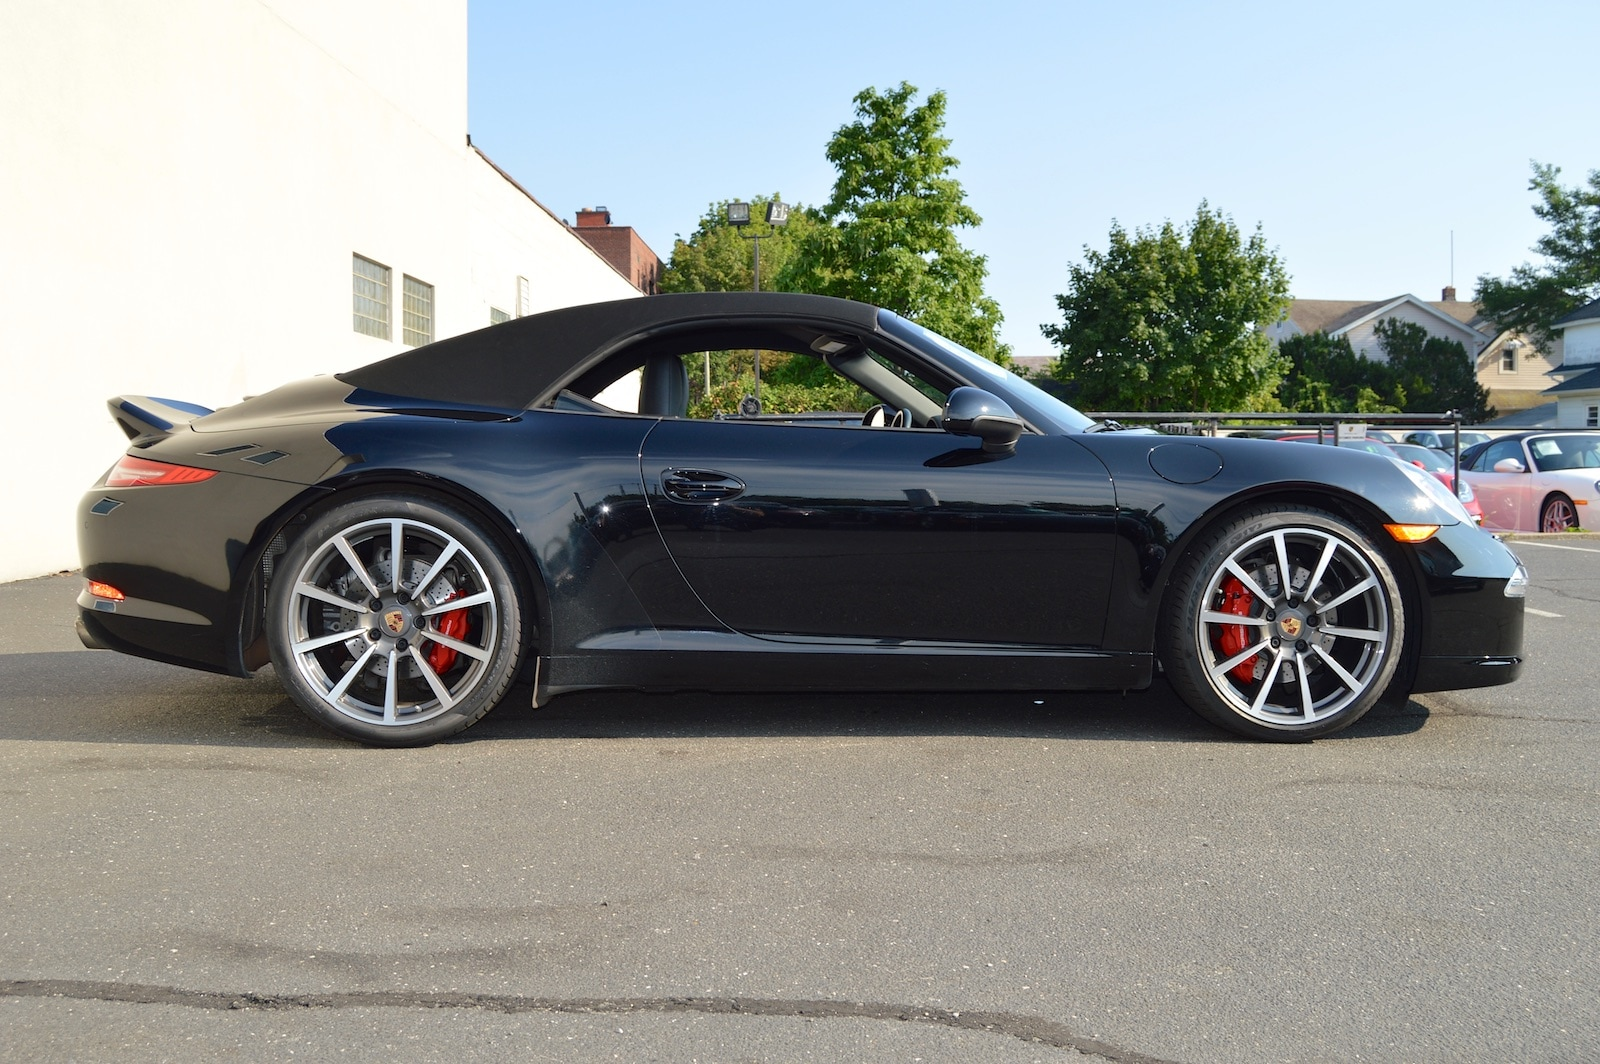 used 2013 porsche 911 carrera s cabriolet for sale